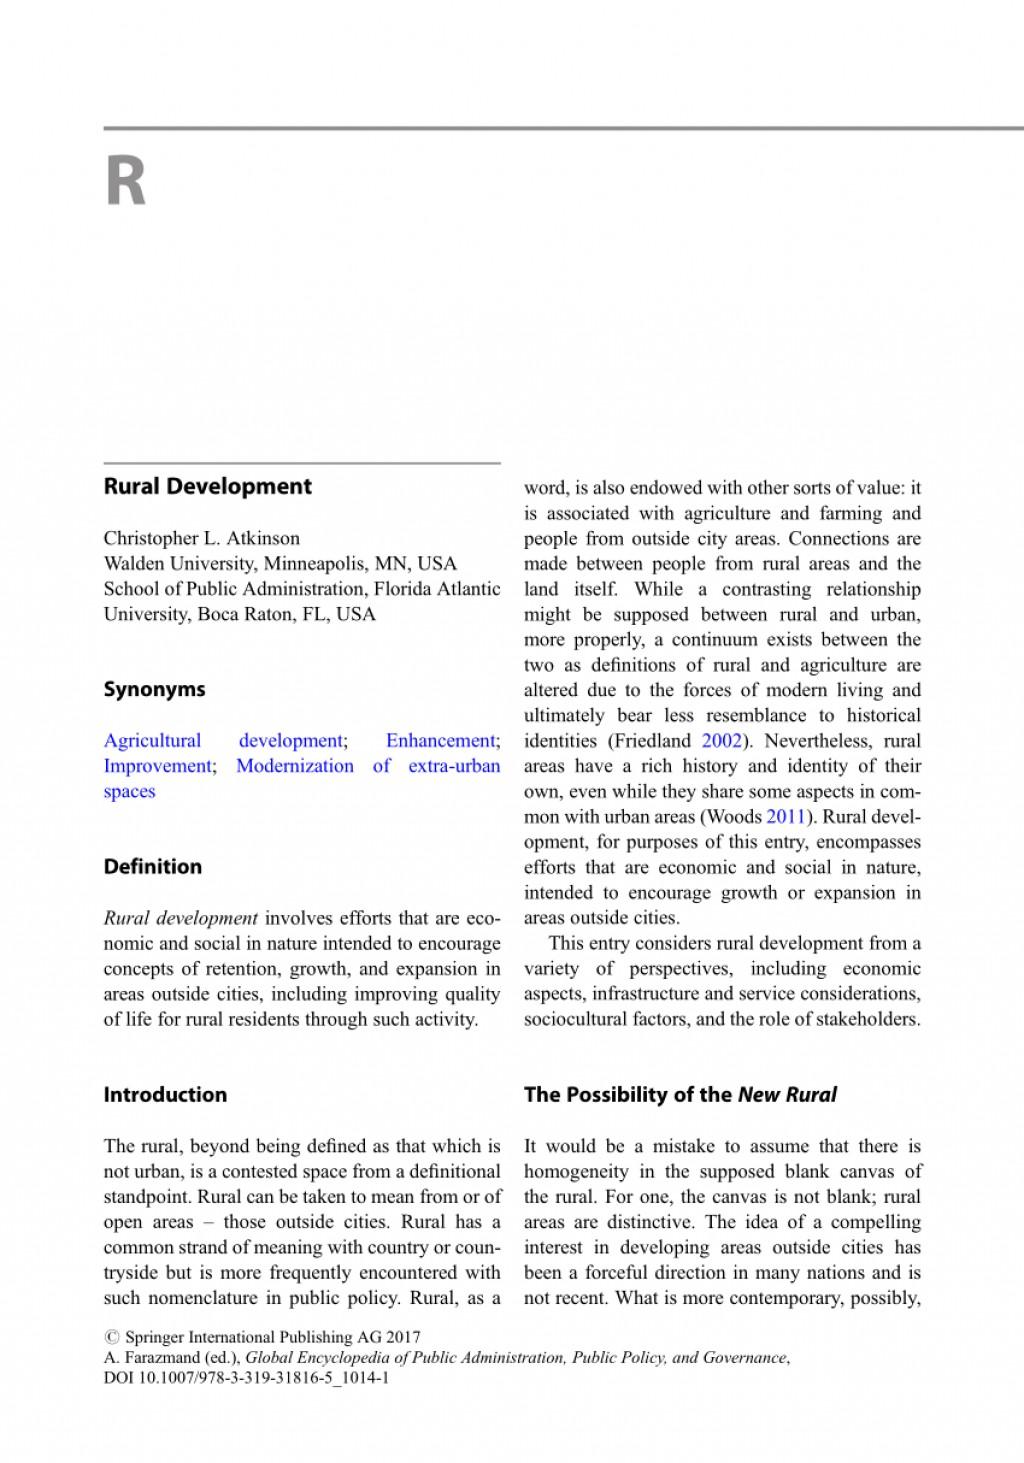 013 Essay Pdf Example Unbelievable Gujarati Free Download Argumentative Terrorism Large